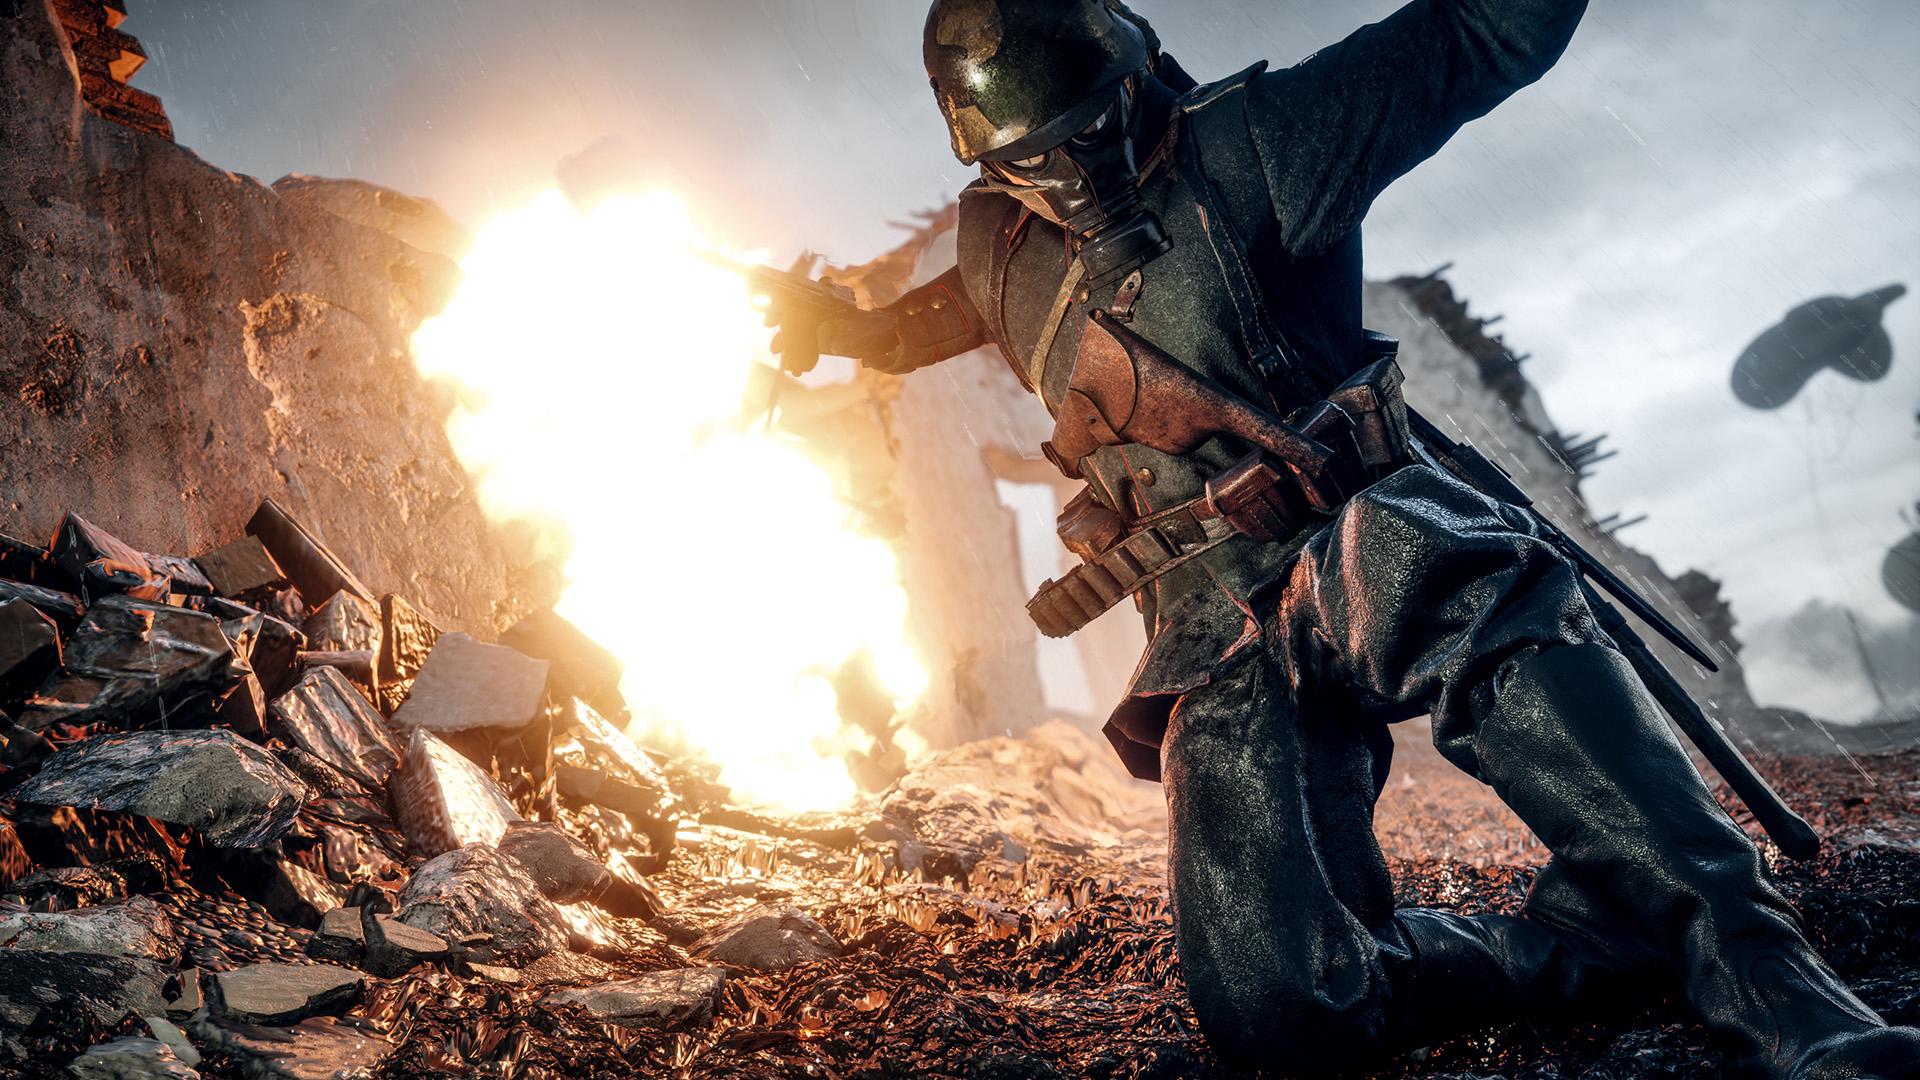 video game battlefield 1 | games hd 4k wallpapers